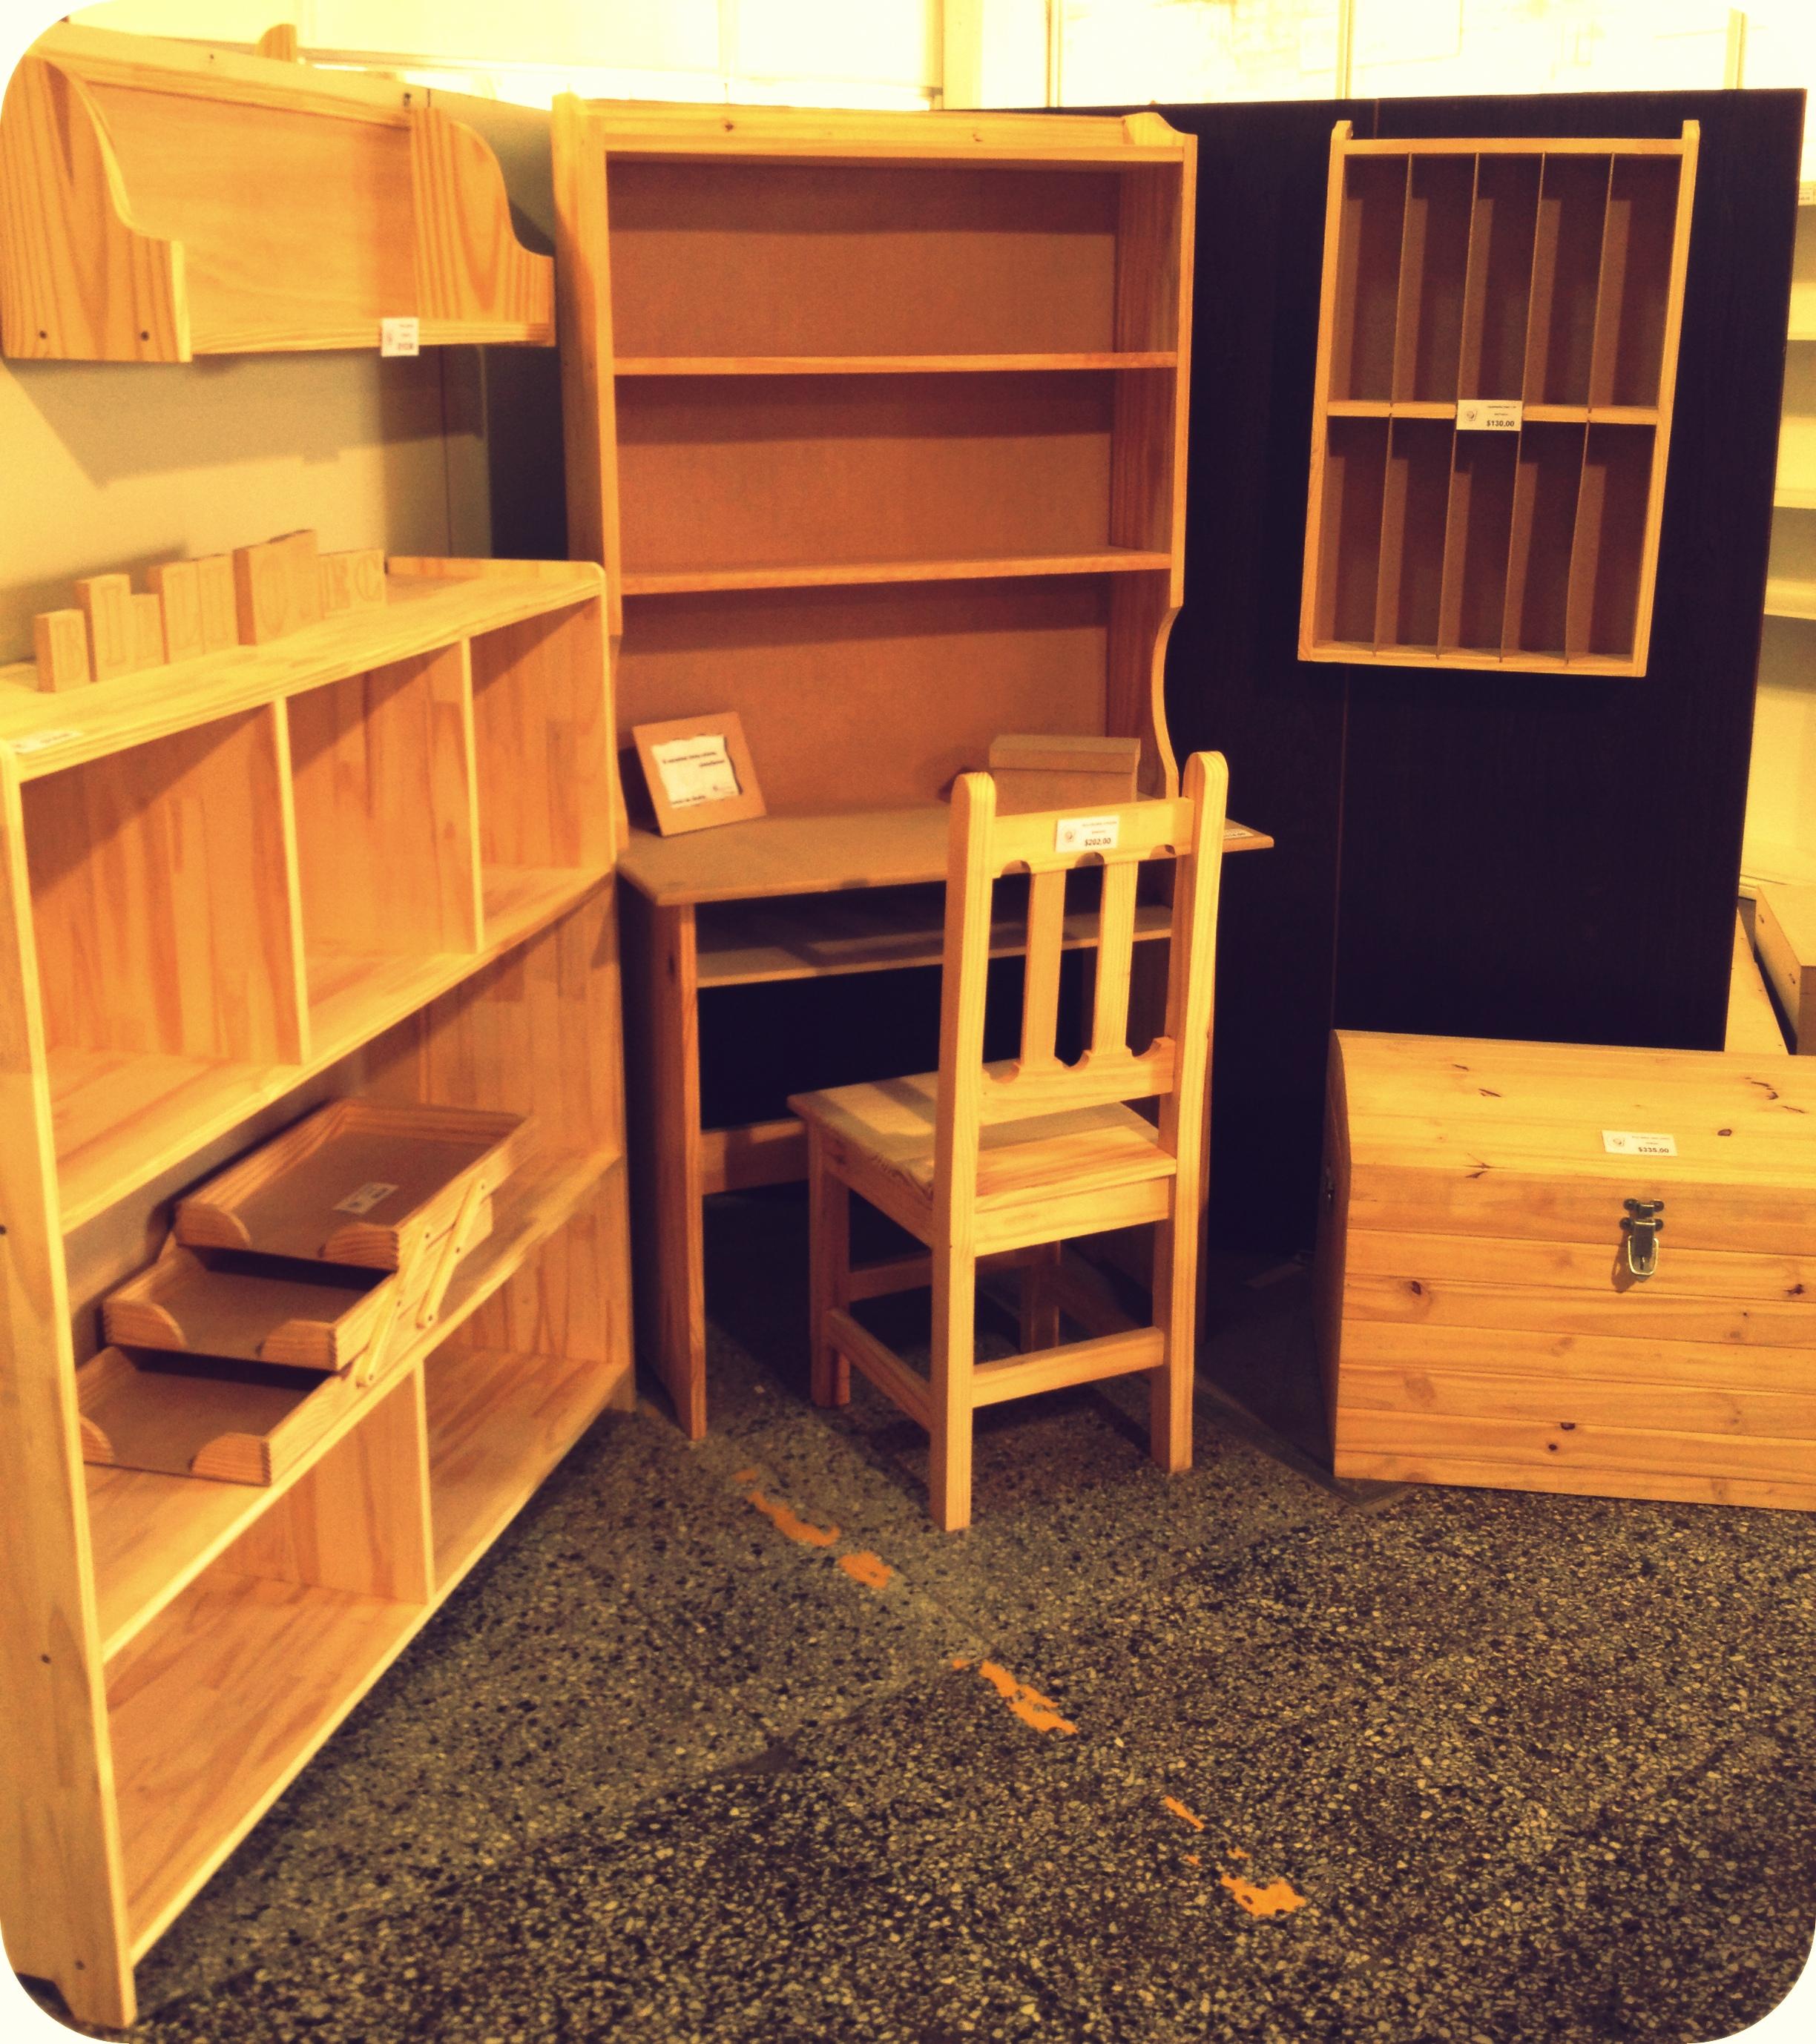 Producto corralon maderas america corralon de salta for Muebles de oficina juarez salta